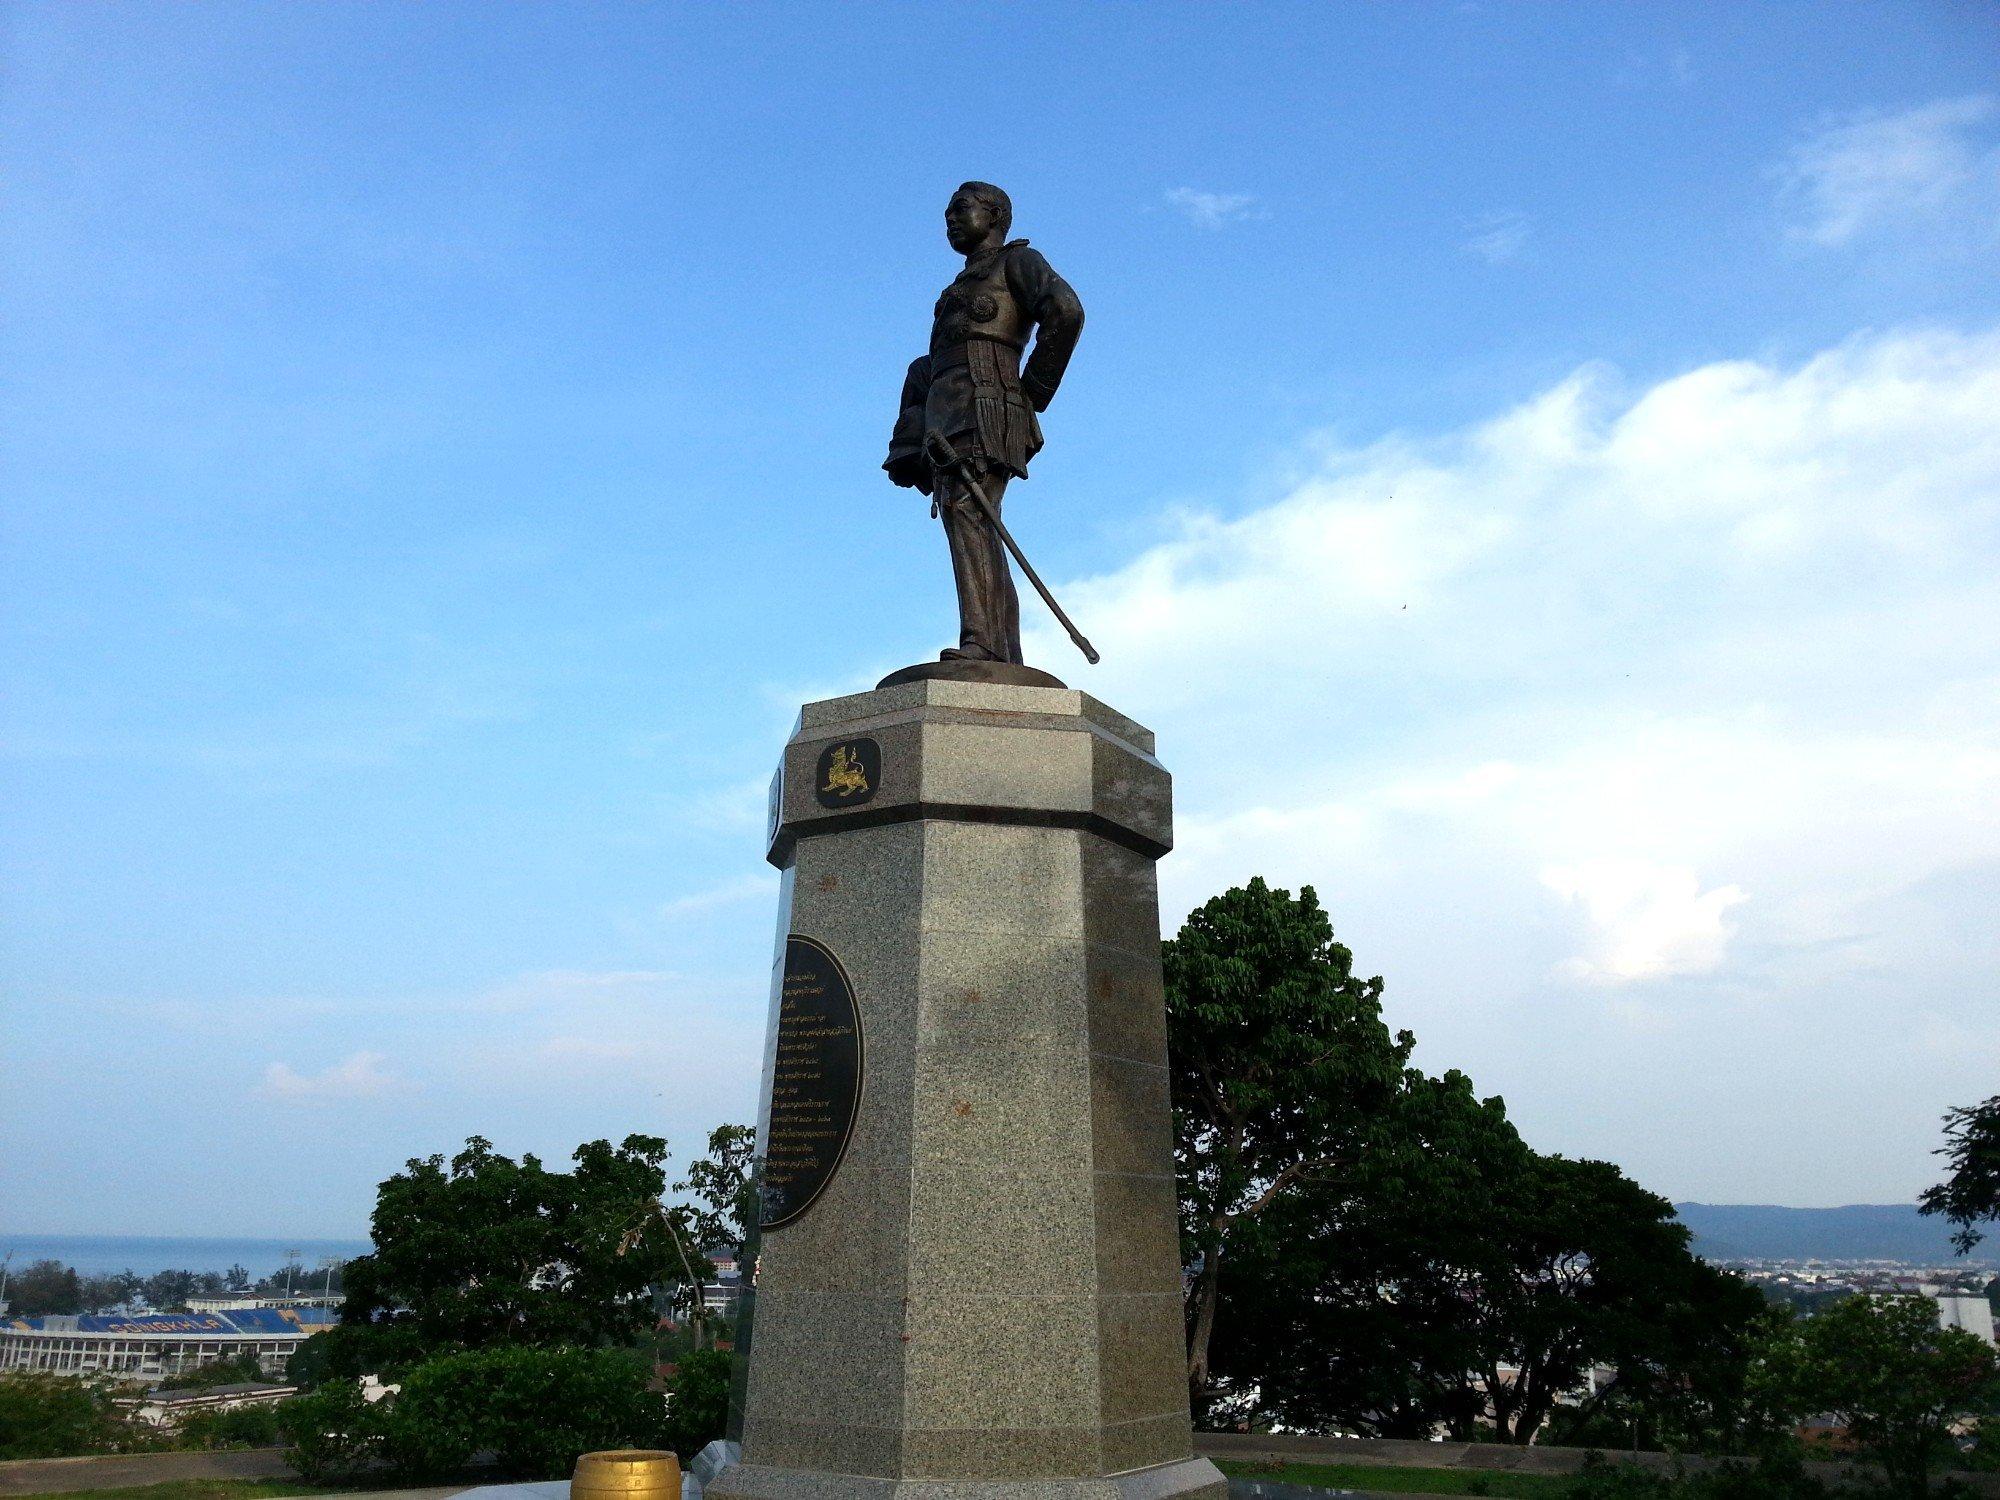 Krom Luang Lopburi Ramet Monument in Songhkla